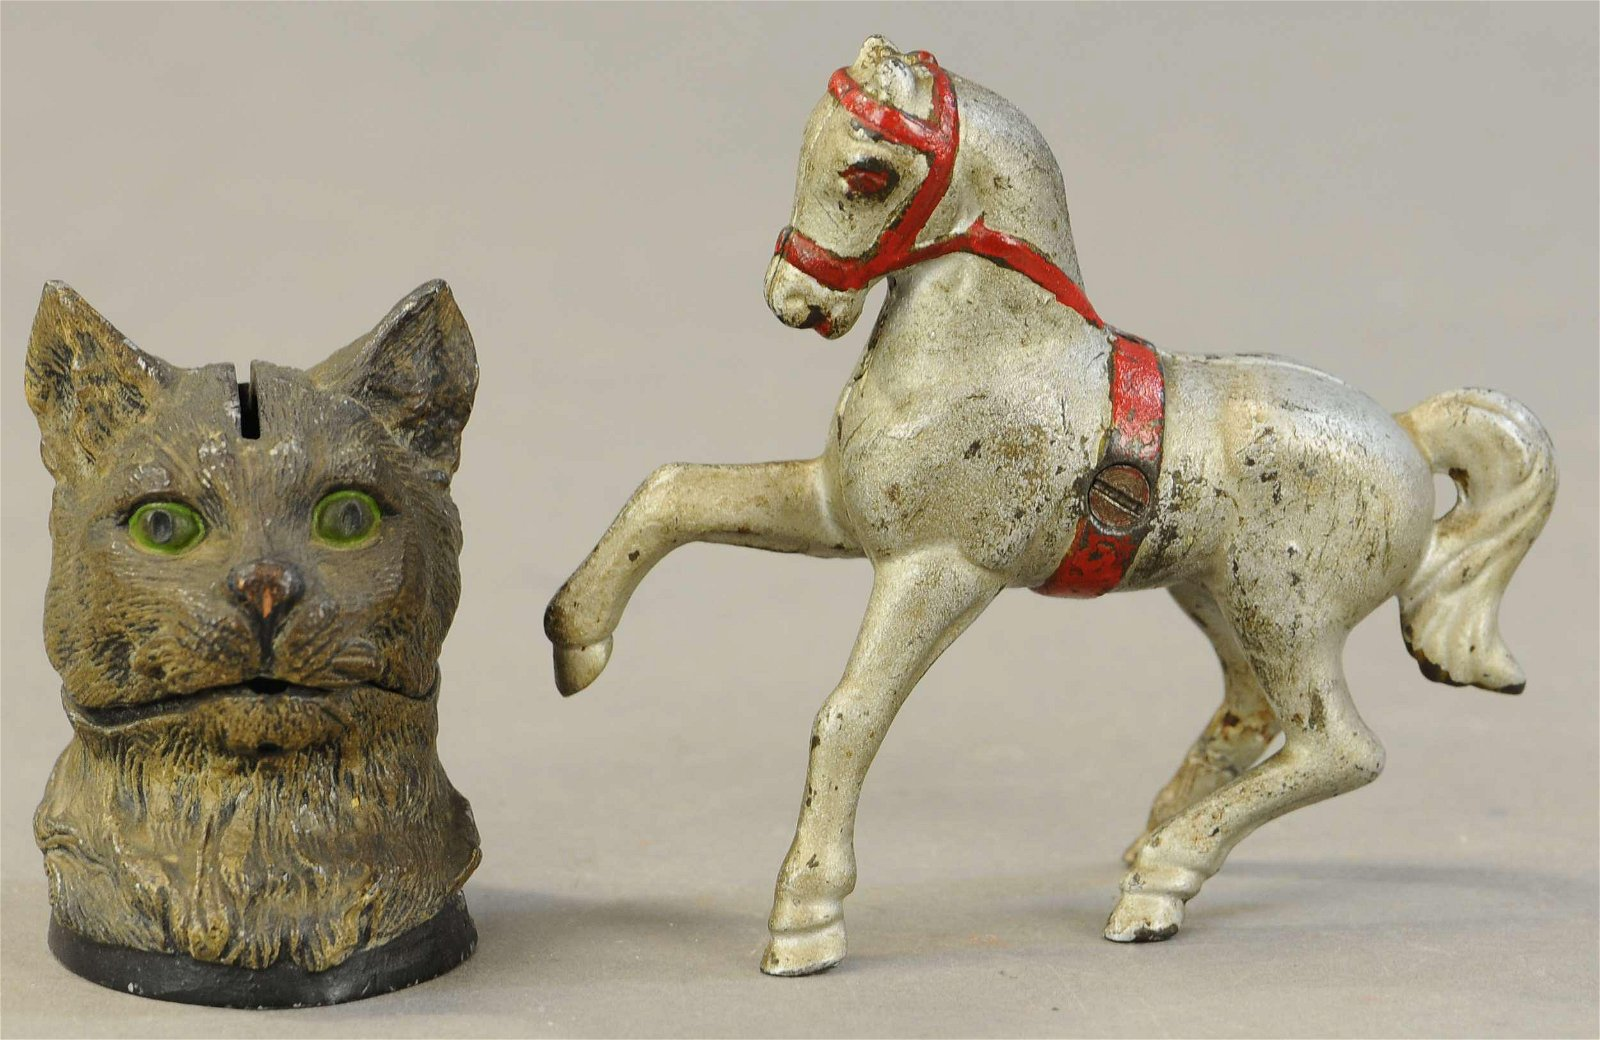 HORSE W/ BELLY BAND & SPELTER CAT STILL BANKS